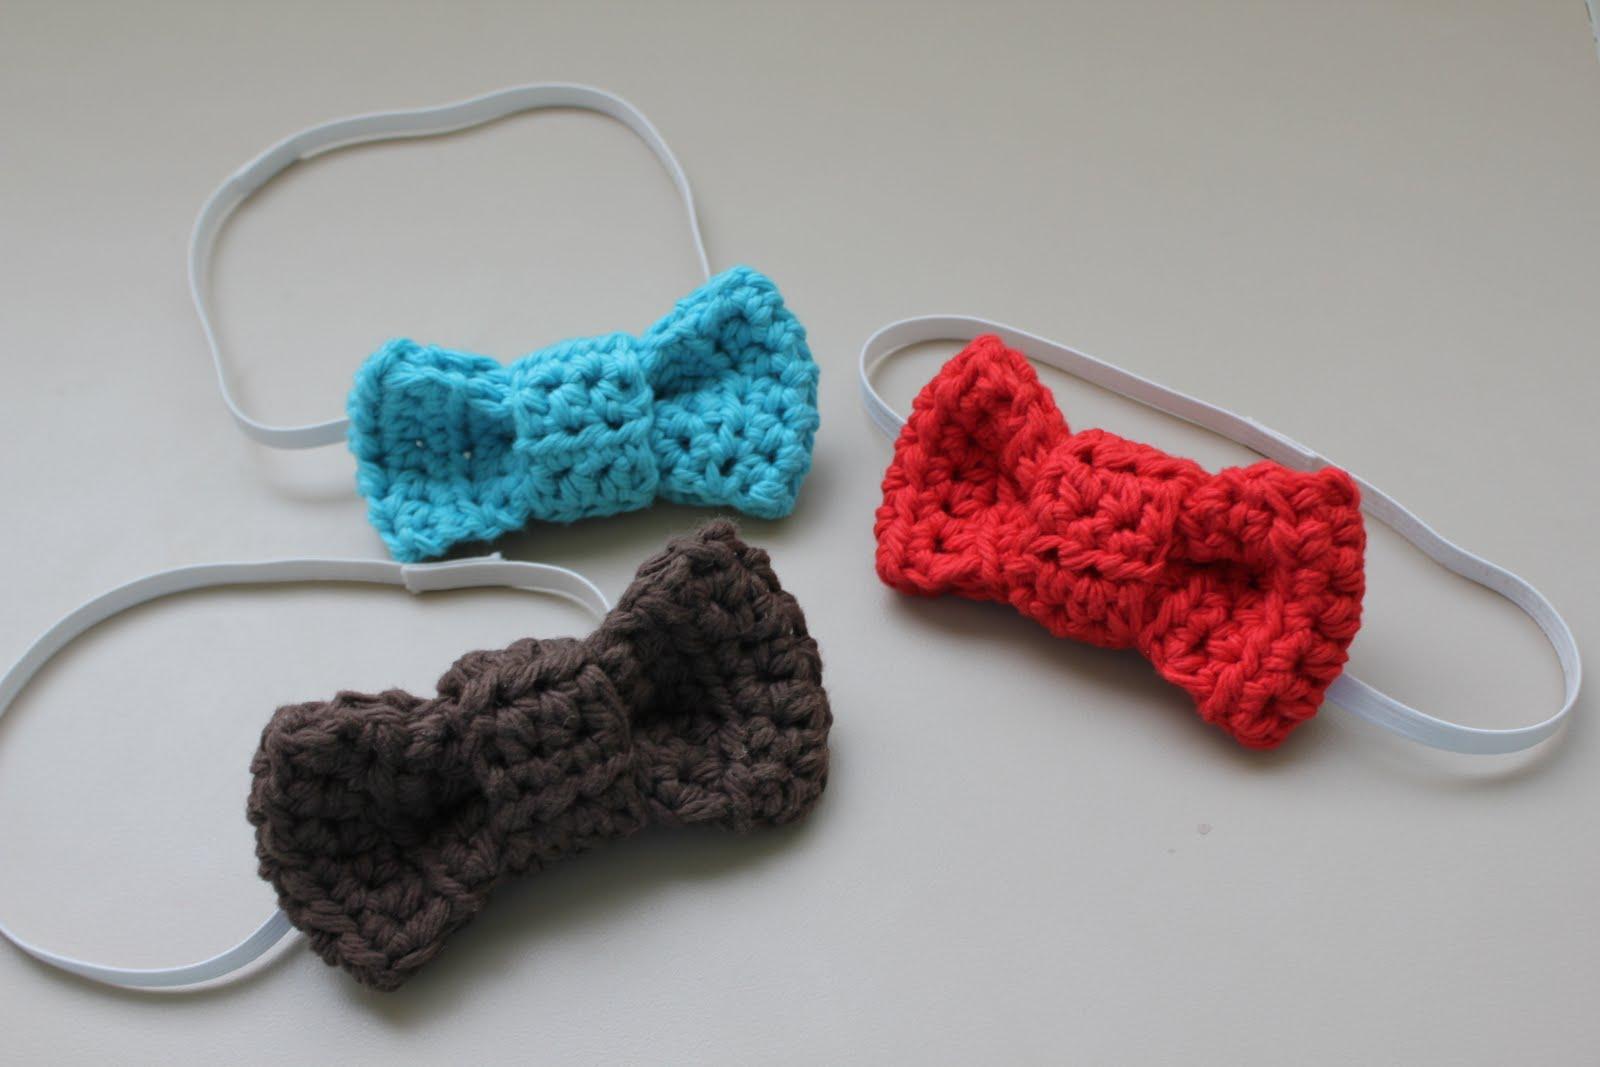 Crochet Bow : RisC Handmade: Crocheted Little Guy Bow Tie